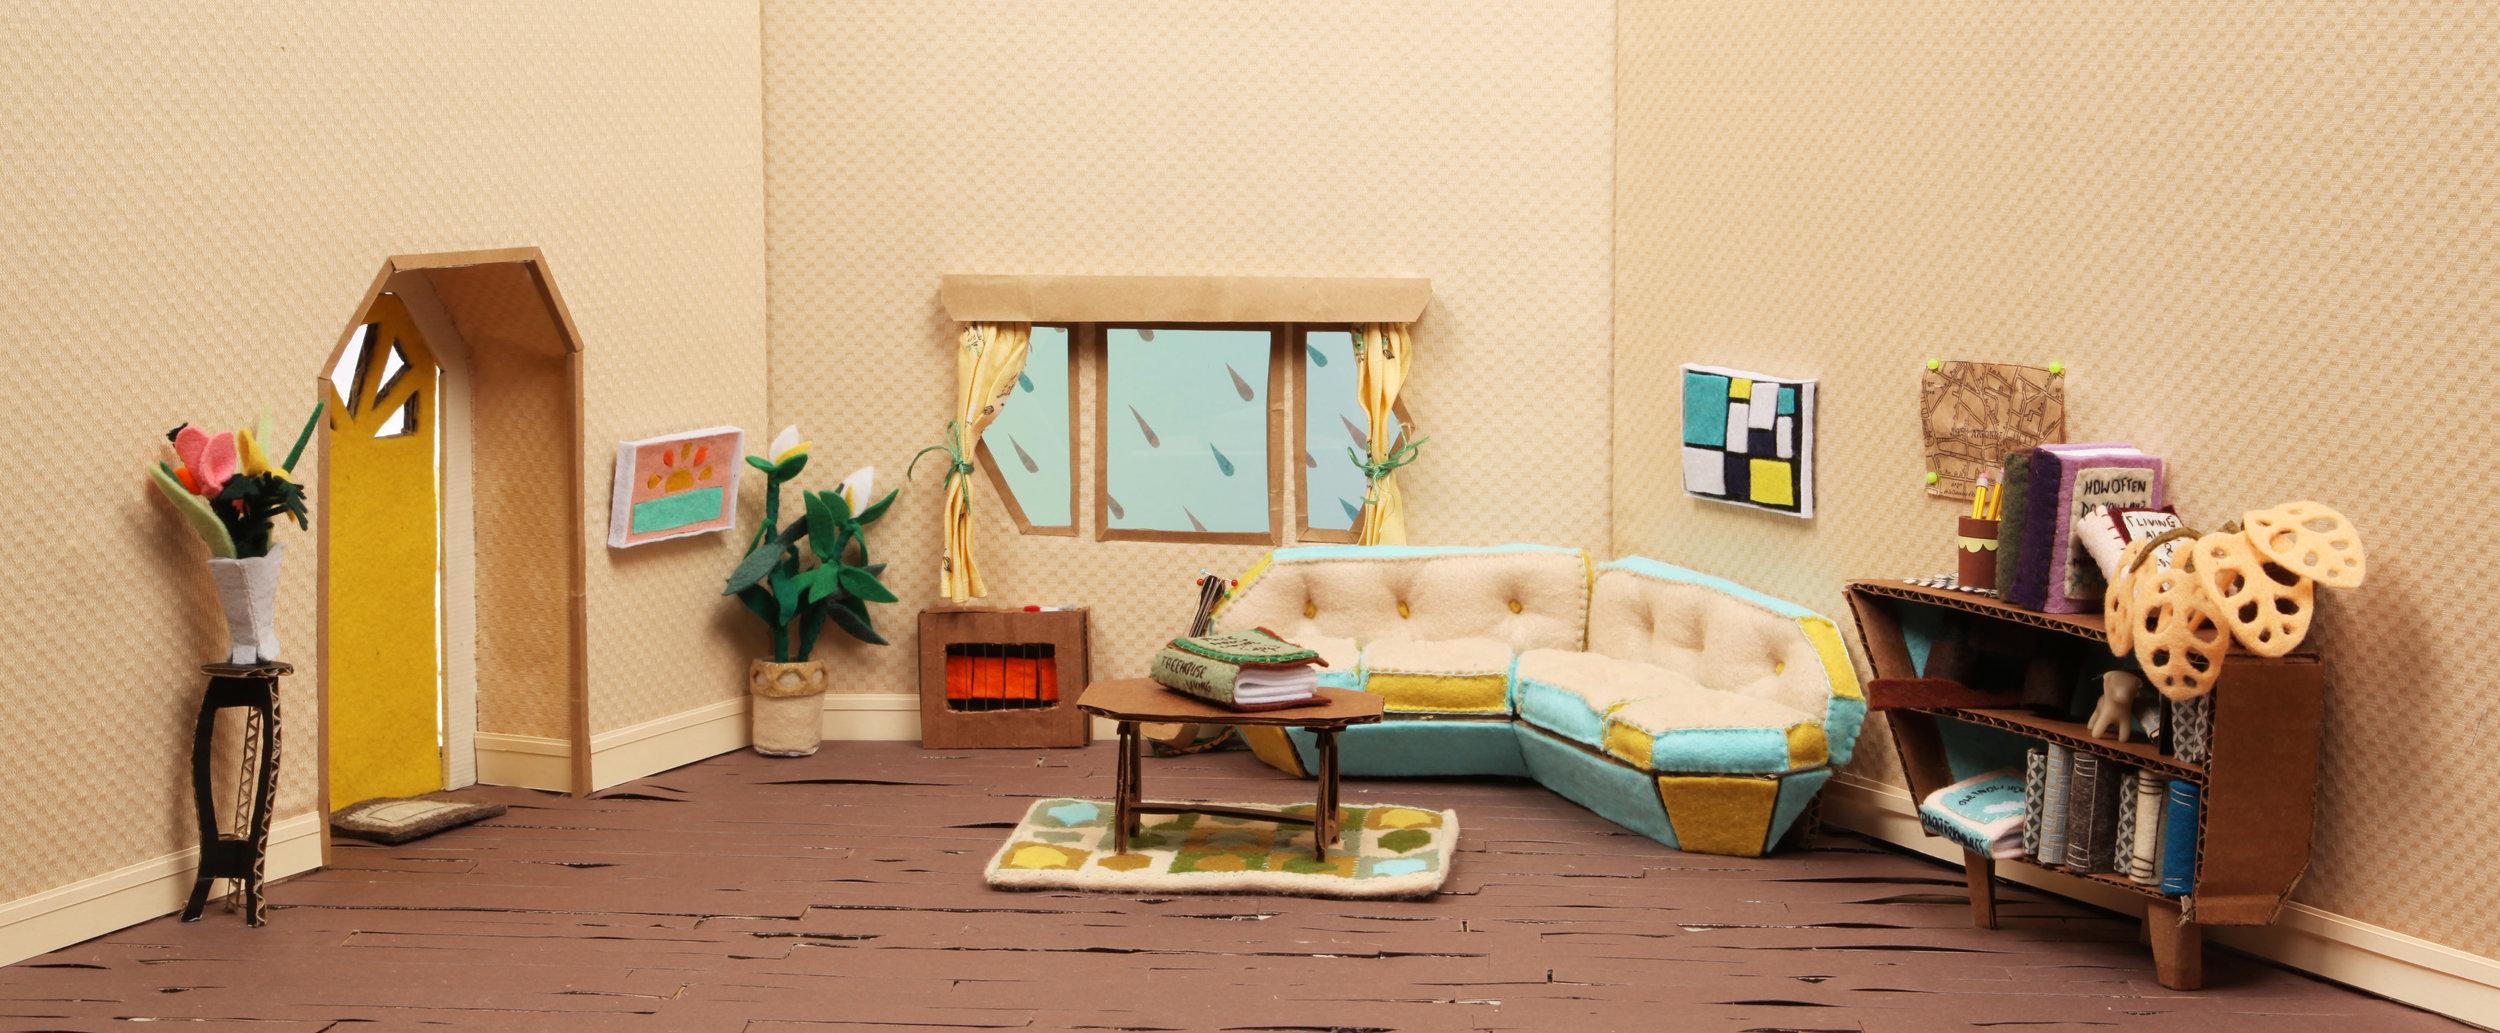 turtle living quarters.jpg